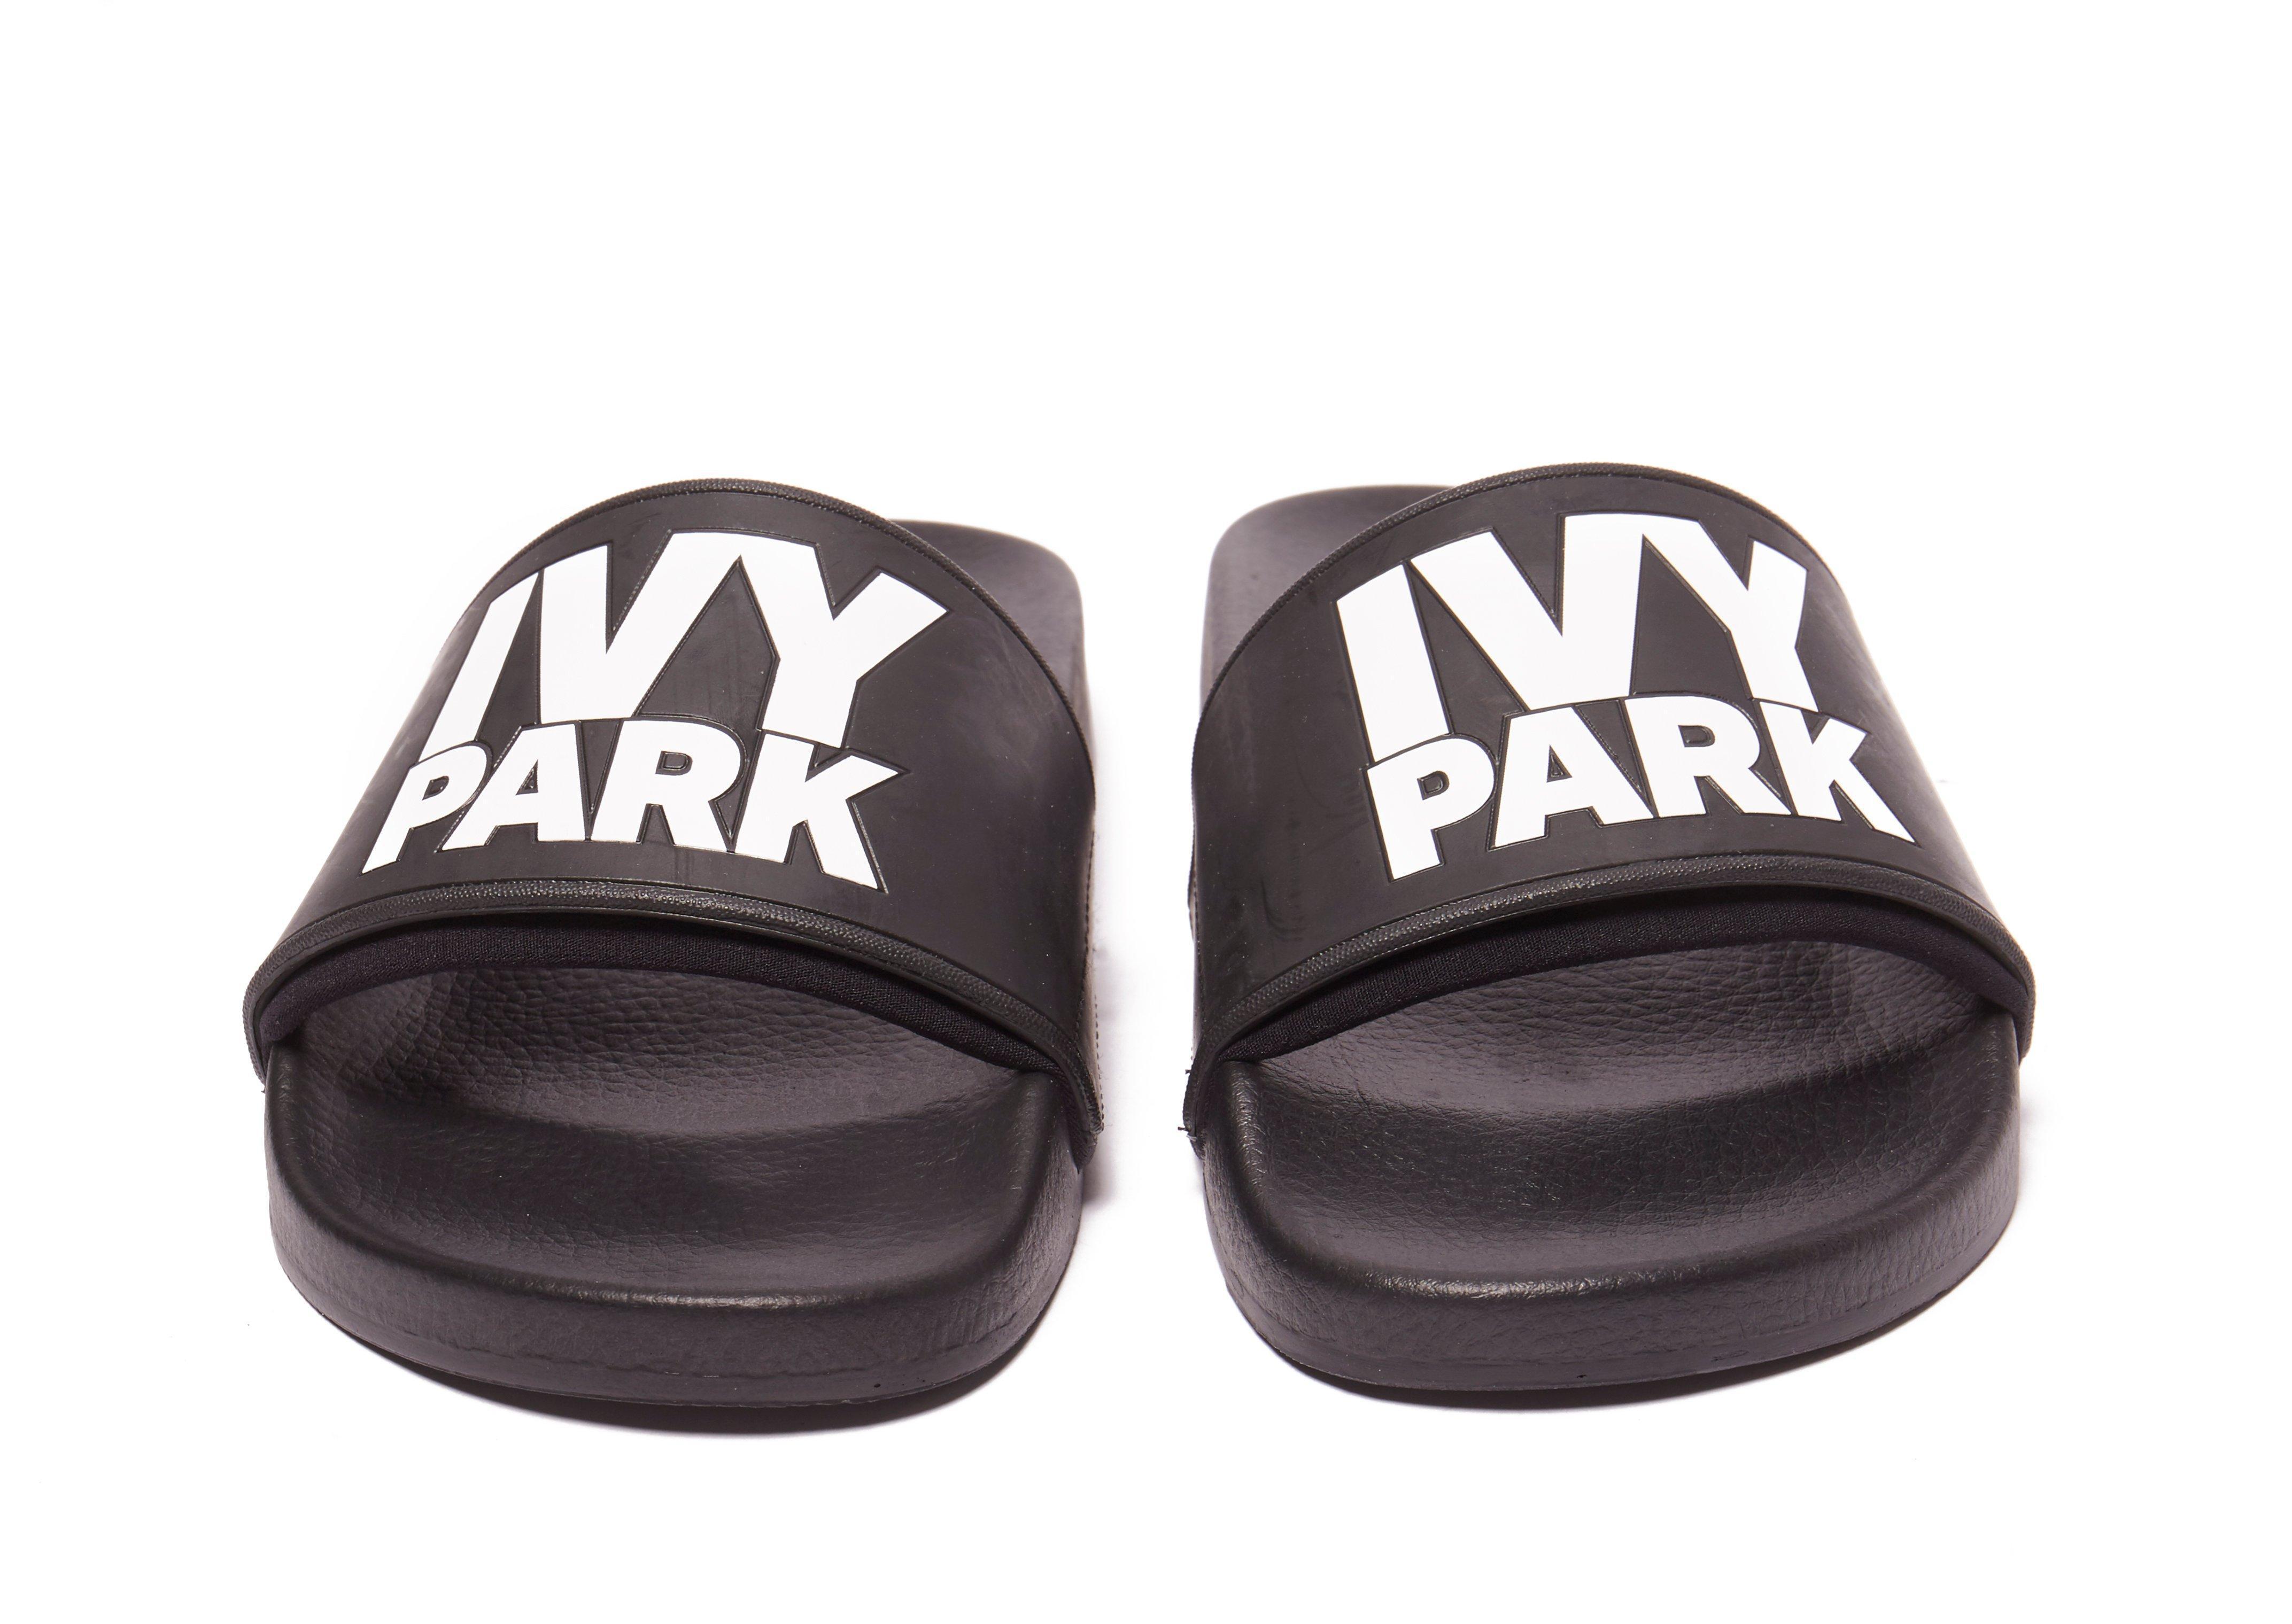 3c529c42015ead Ivy Park Neo Slides in Black - Lyst